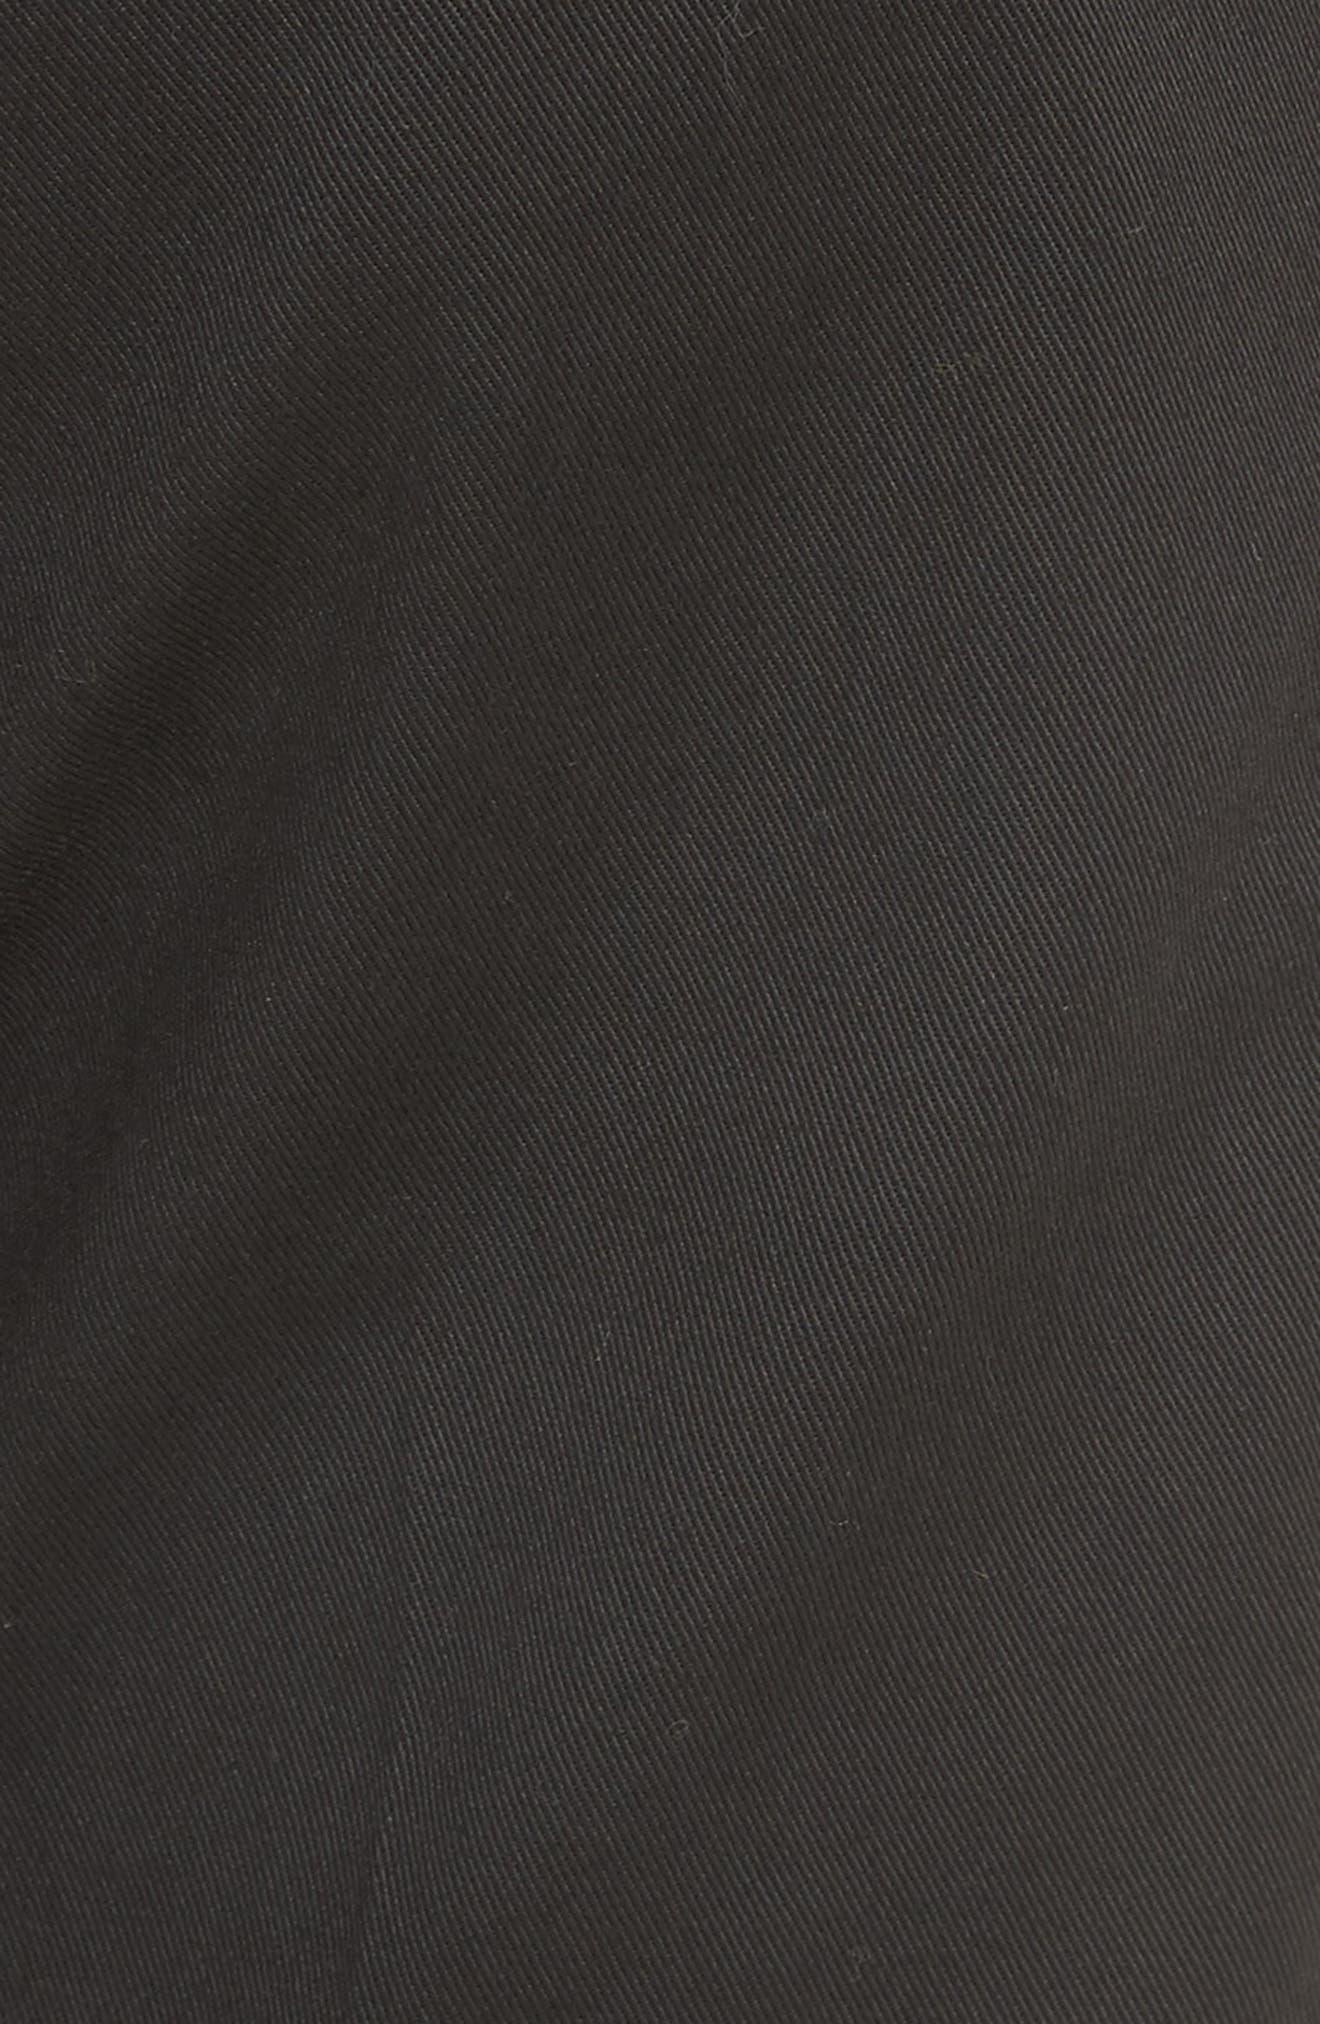 Dan Skinny Fit Cropped Trousers,                             Alternate thumbnail 5, color,                             001